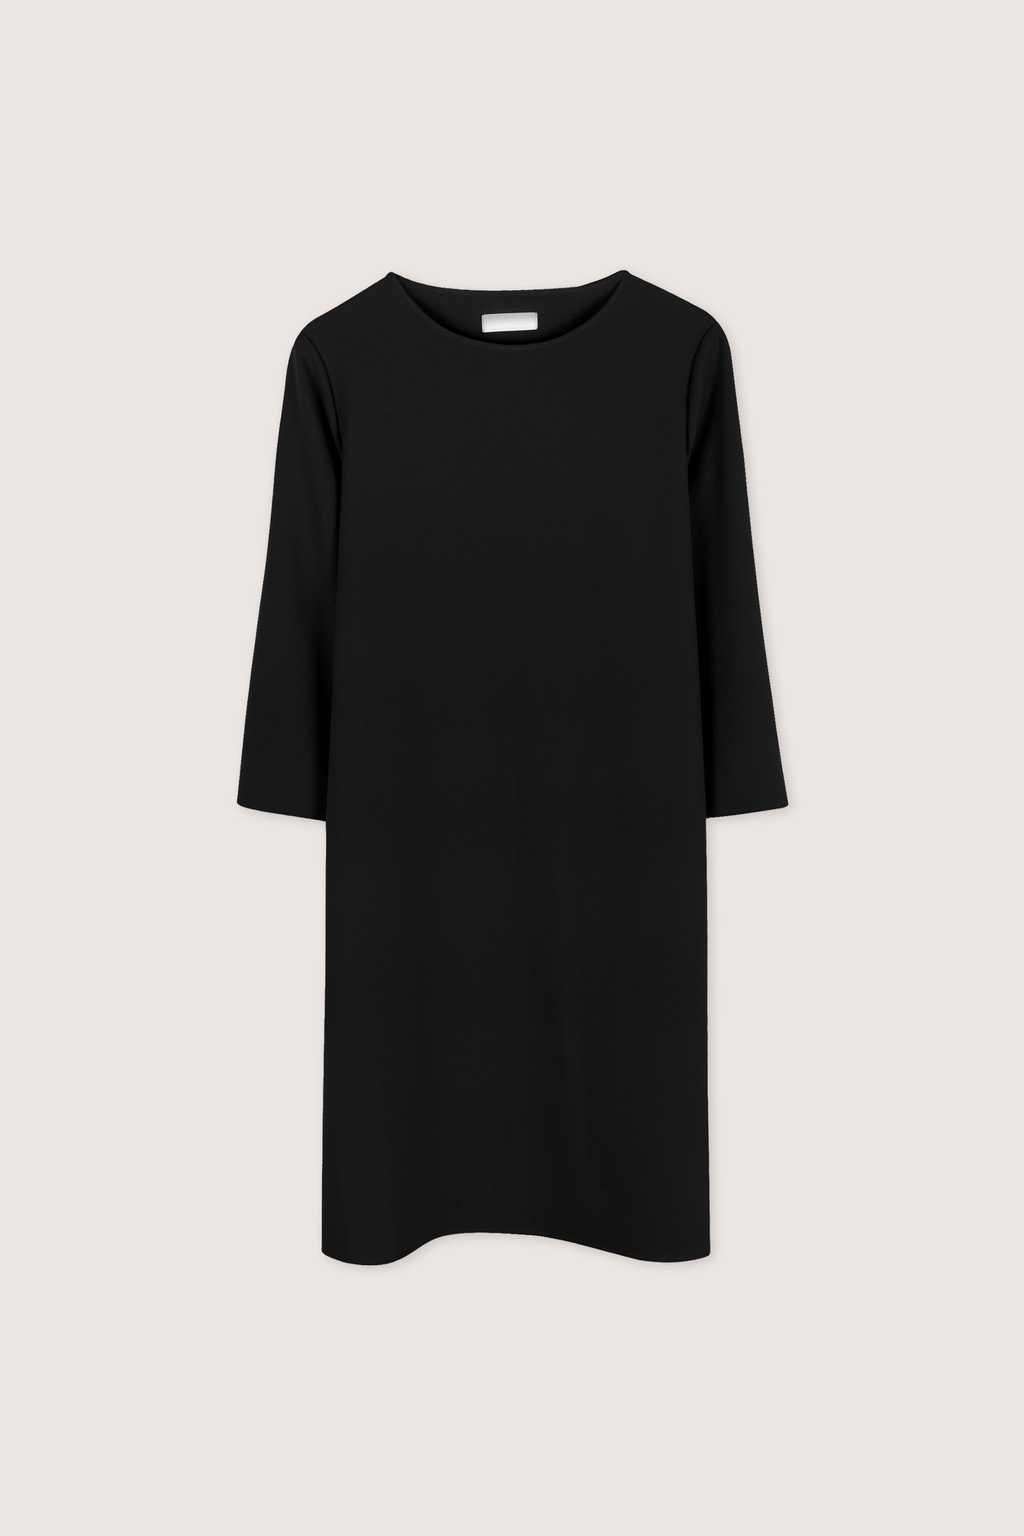 Dress 1574 Black 9